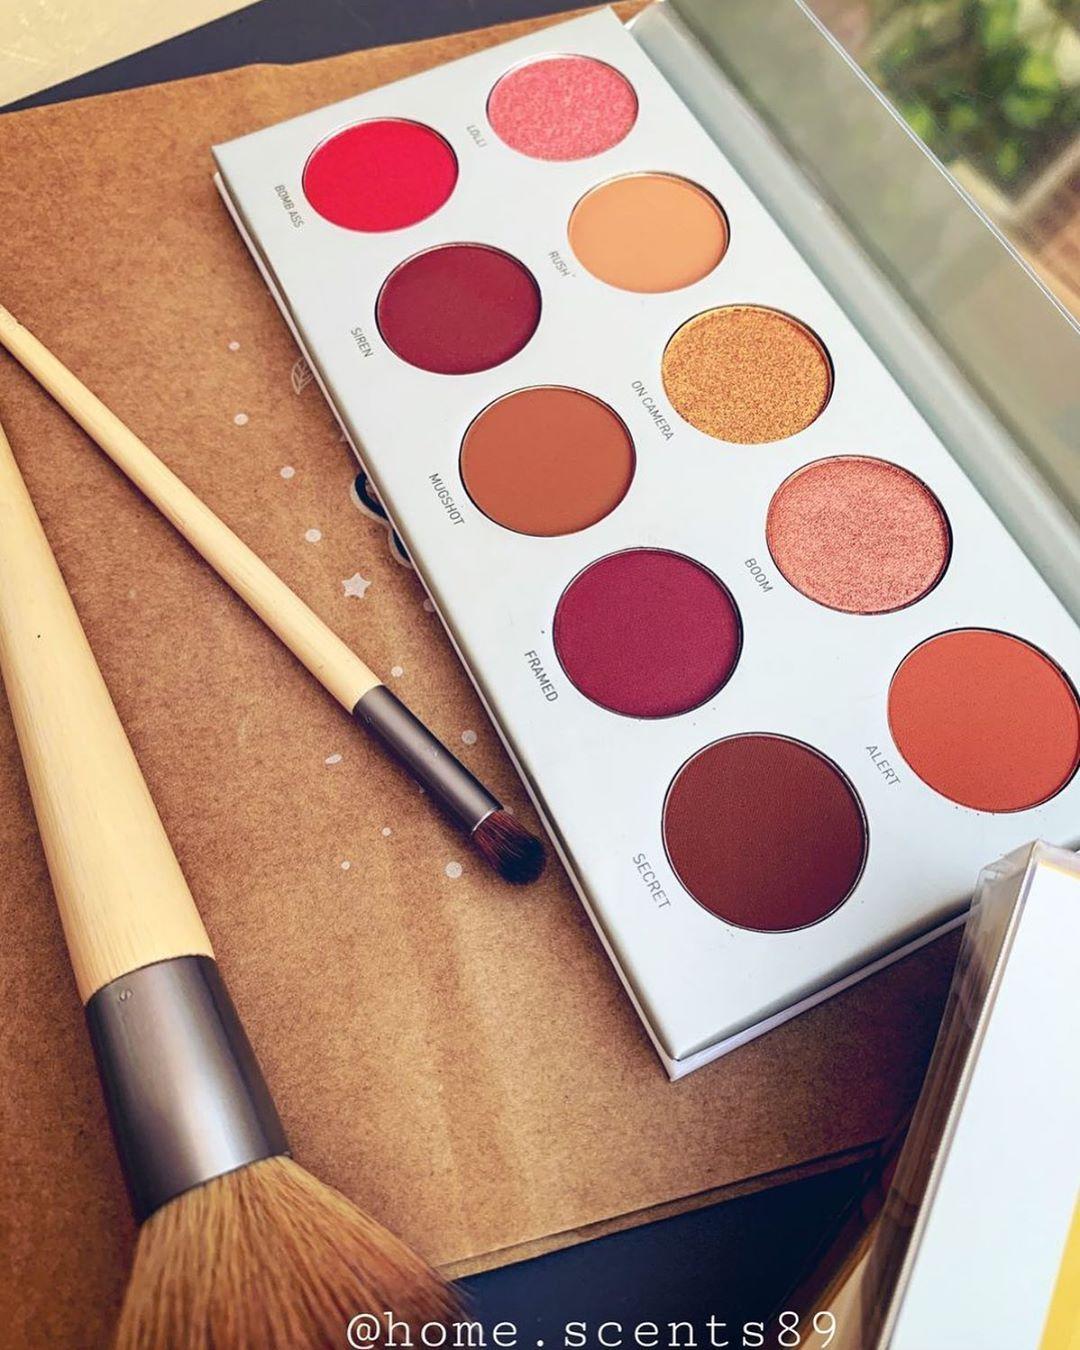 Morphe X Jaclyn Hill باليت جاكلين هيل بالتعاون مع مورفي مورفي مشهوره بمنتجاتها وباسعارها المناسبه ودائما اتسوي تعاون مع خبراء ت Eyeshadow Blush Beauty